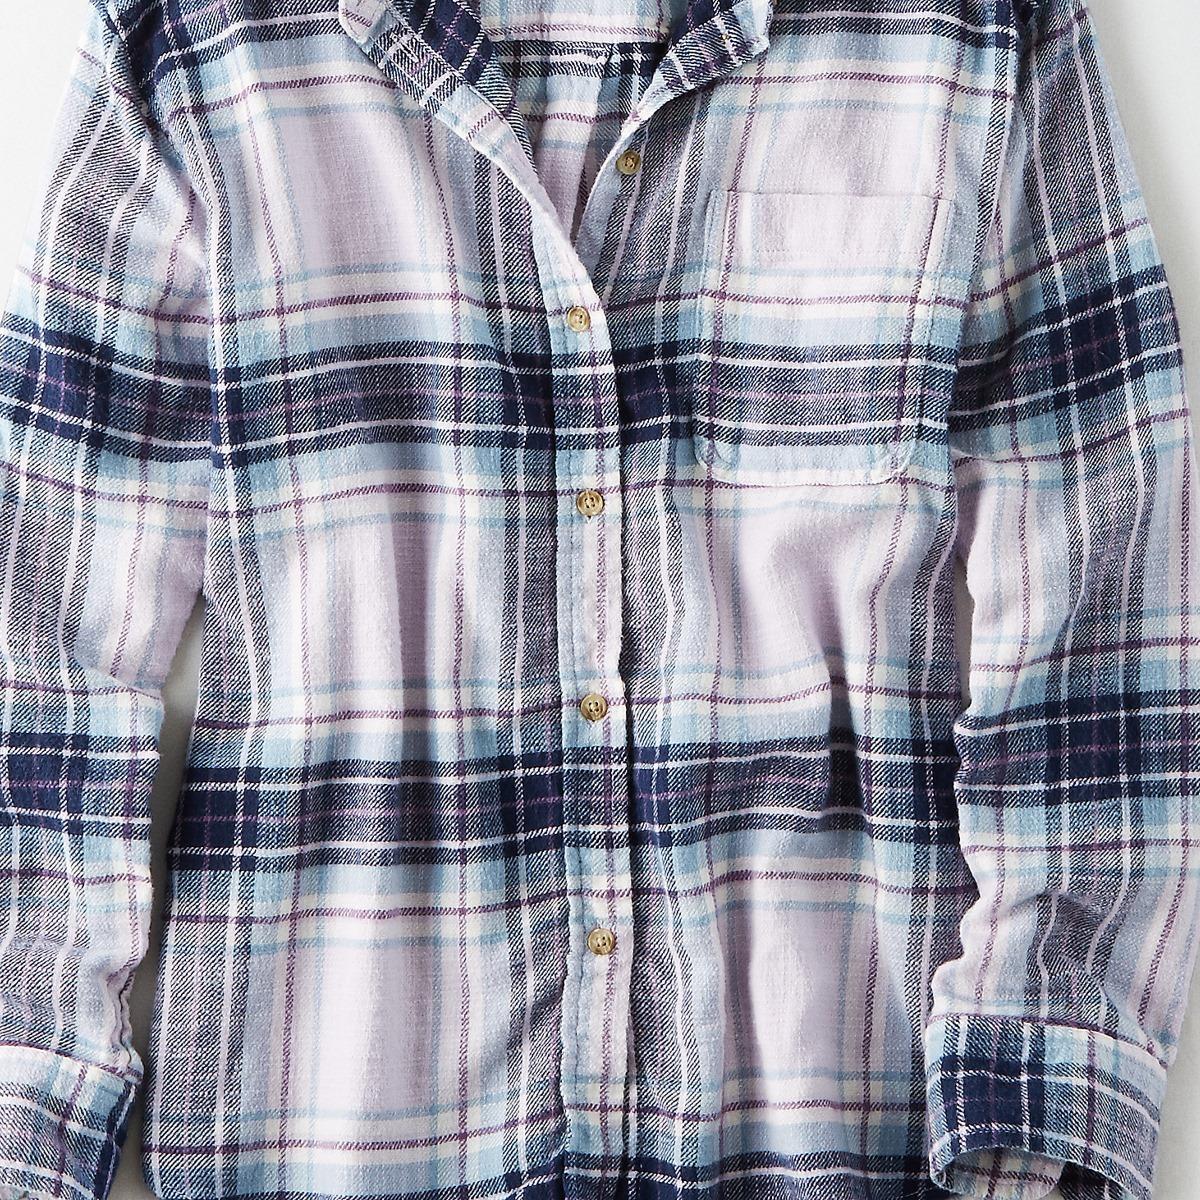 AEO Ahh-Mazingly Soft Boyfriend Plaid Shirt